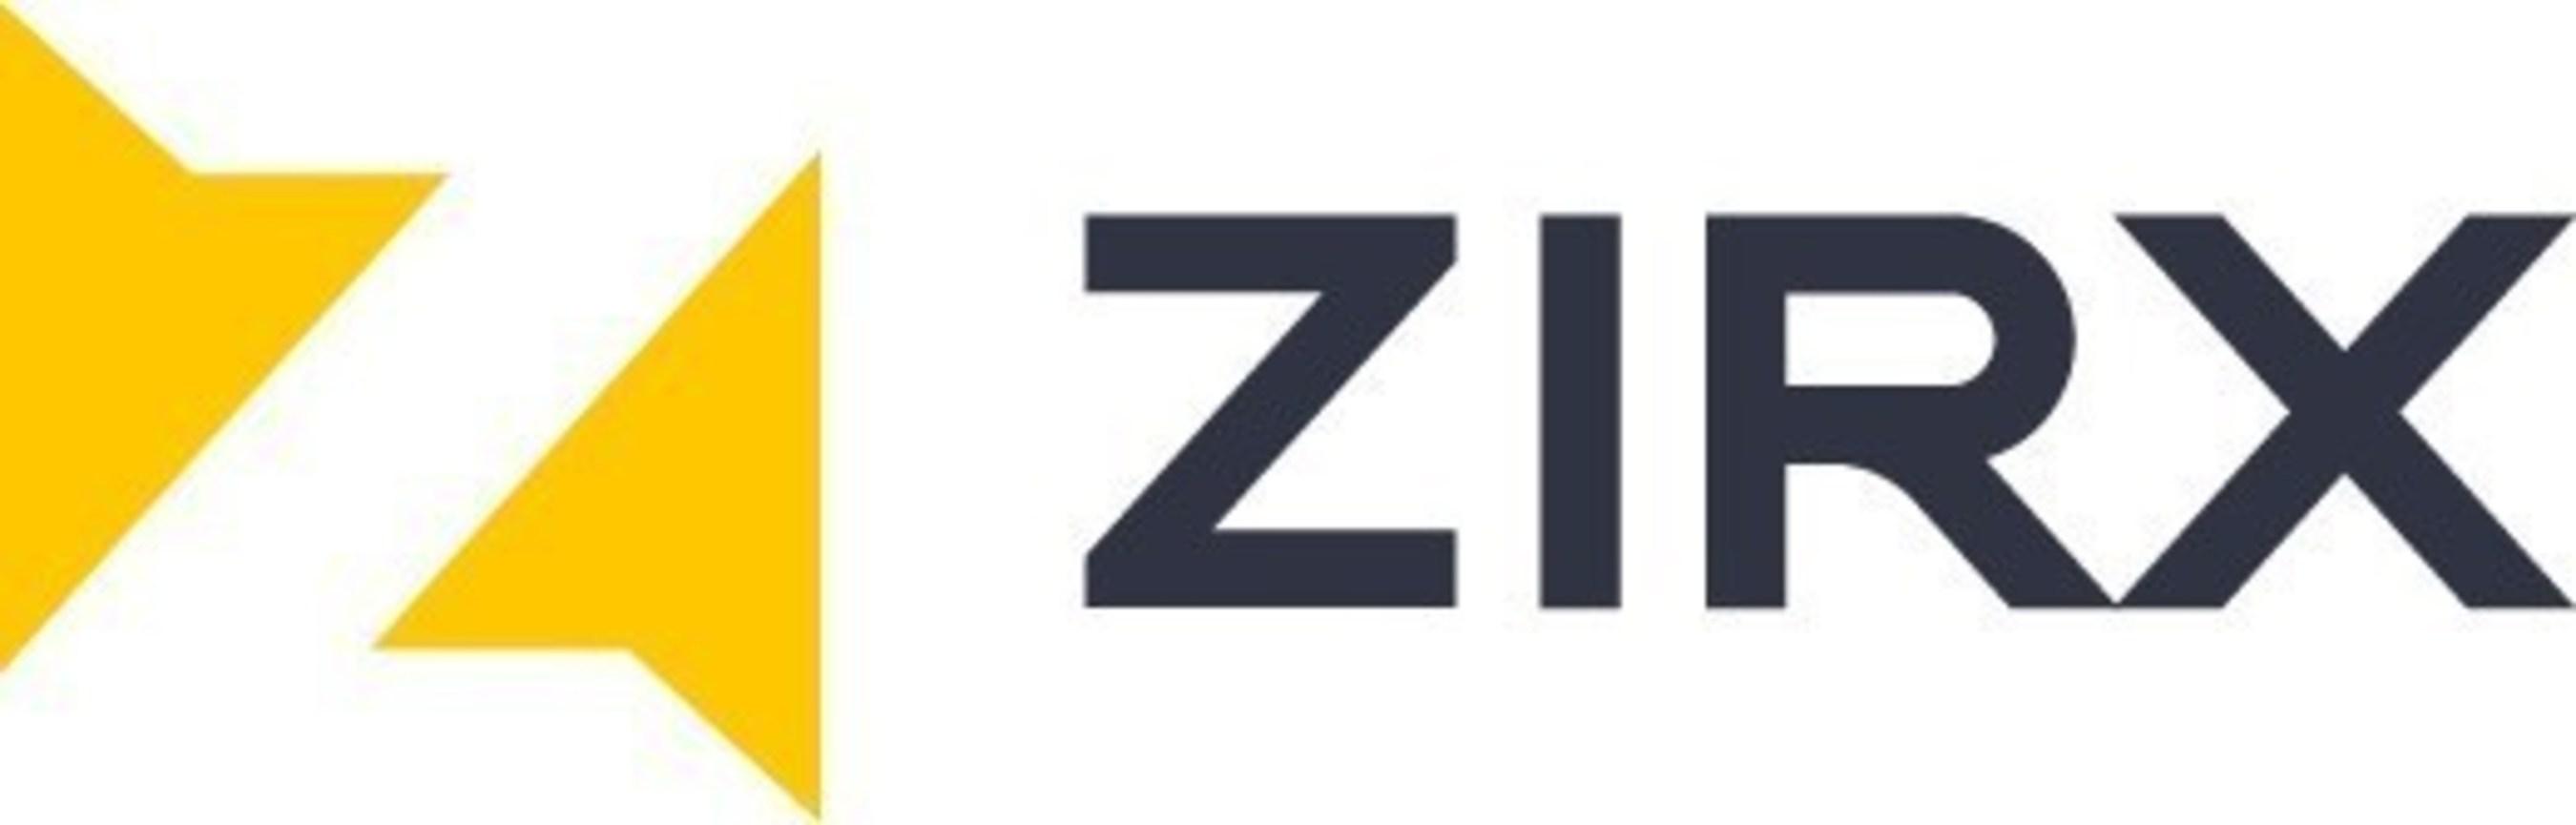 ZIRX logo